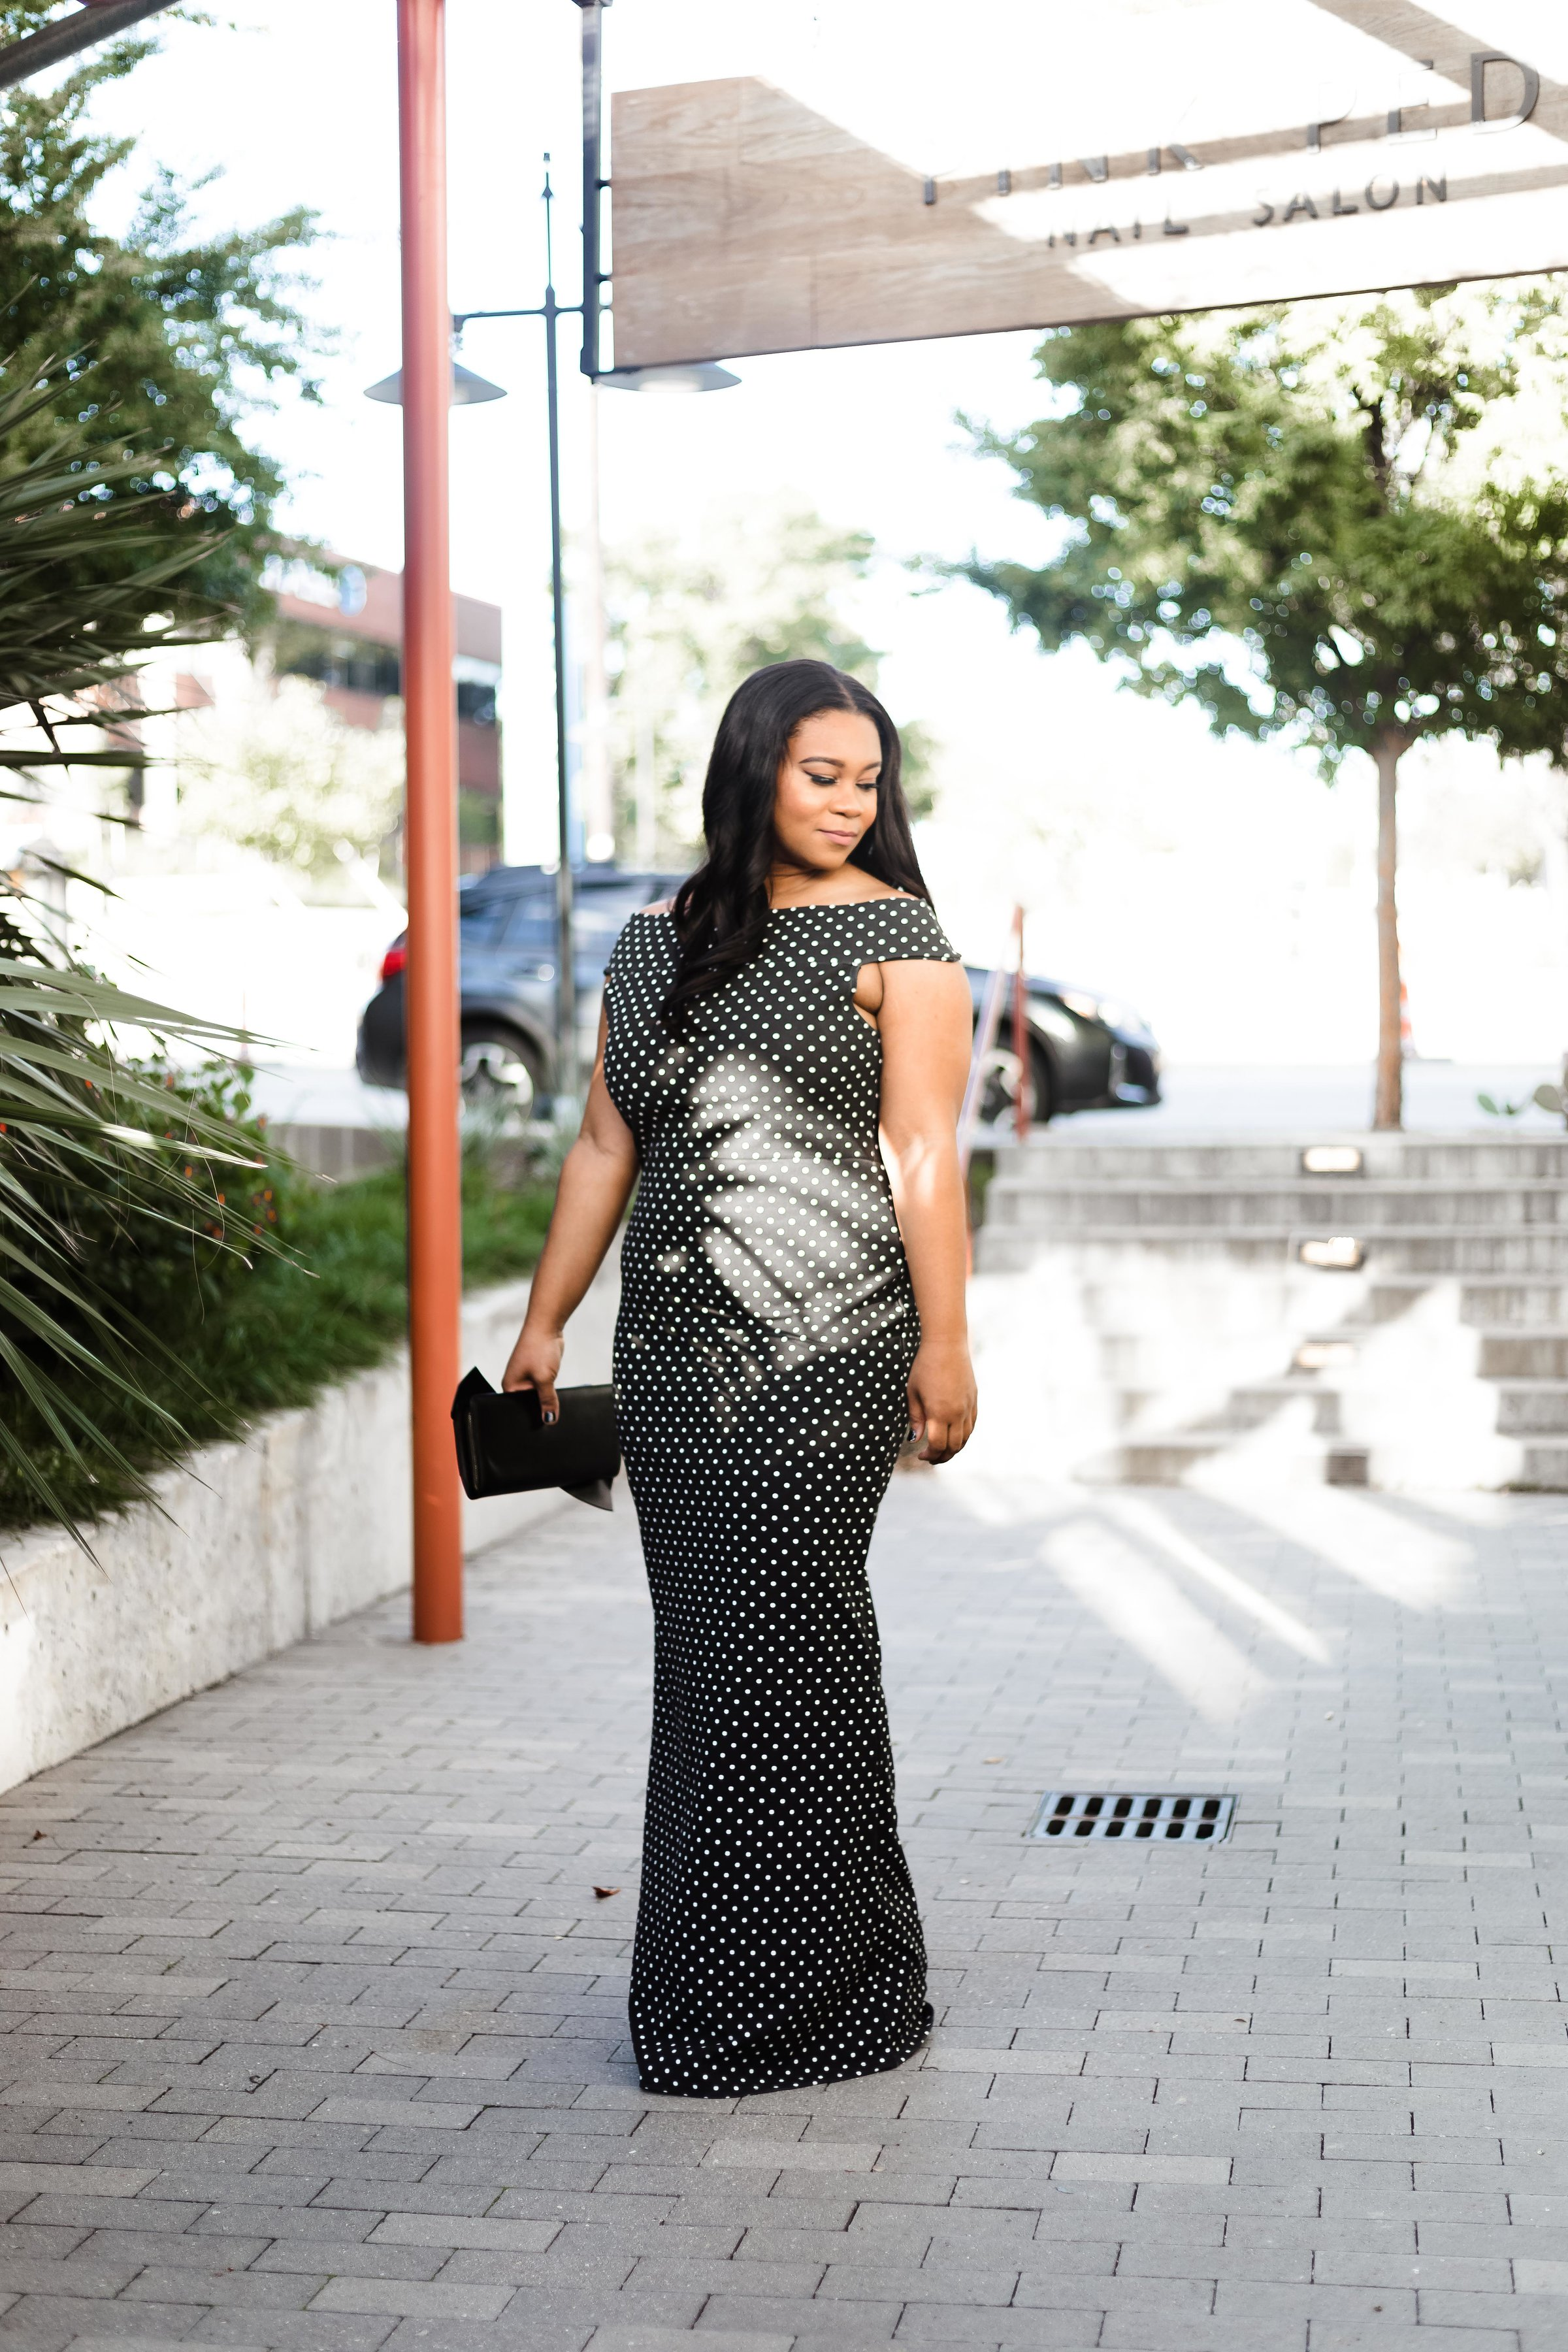 Polka Dot Maxi Dress - Natalie Greagor (7).jpg